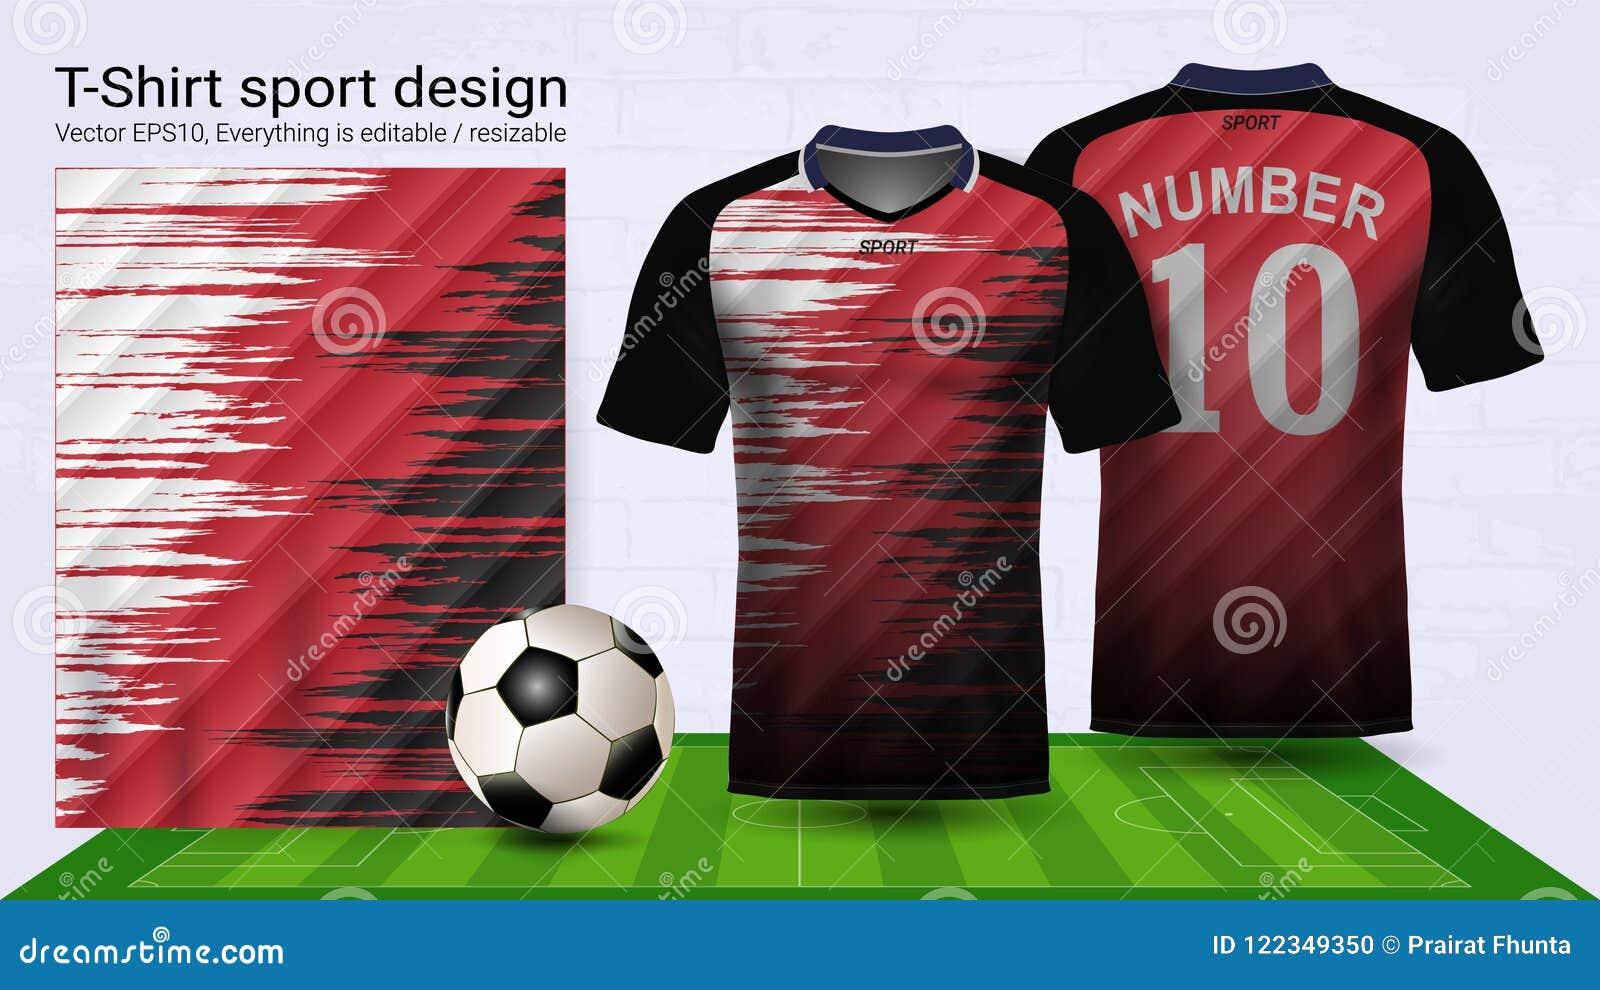 1bbfa35f871 Soccer Jersey And T-shirt Sport Mockup Template